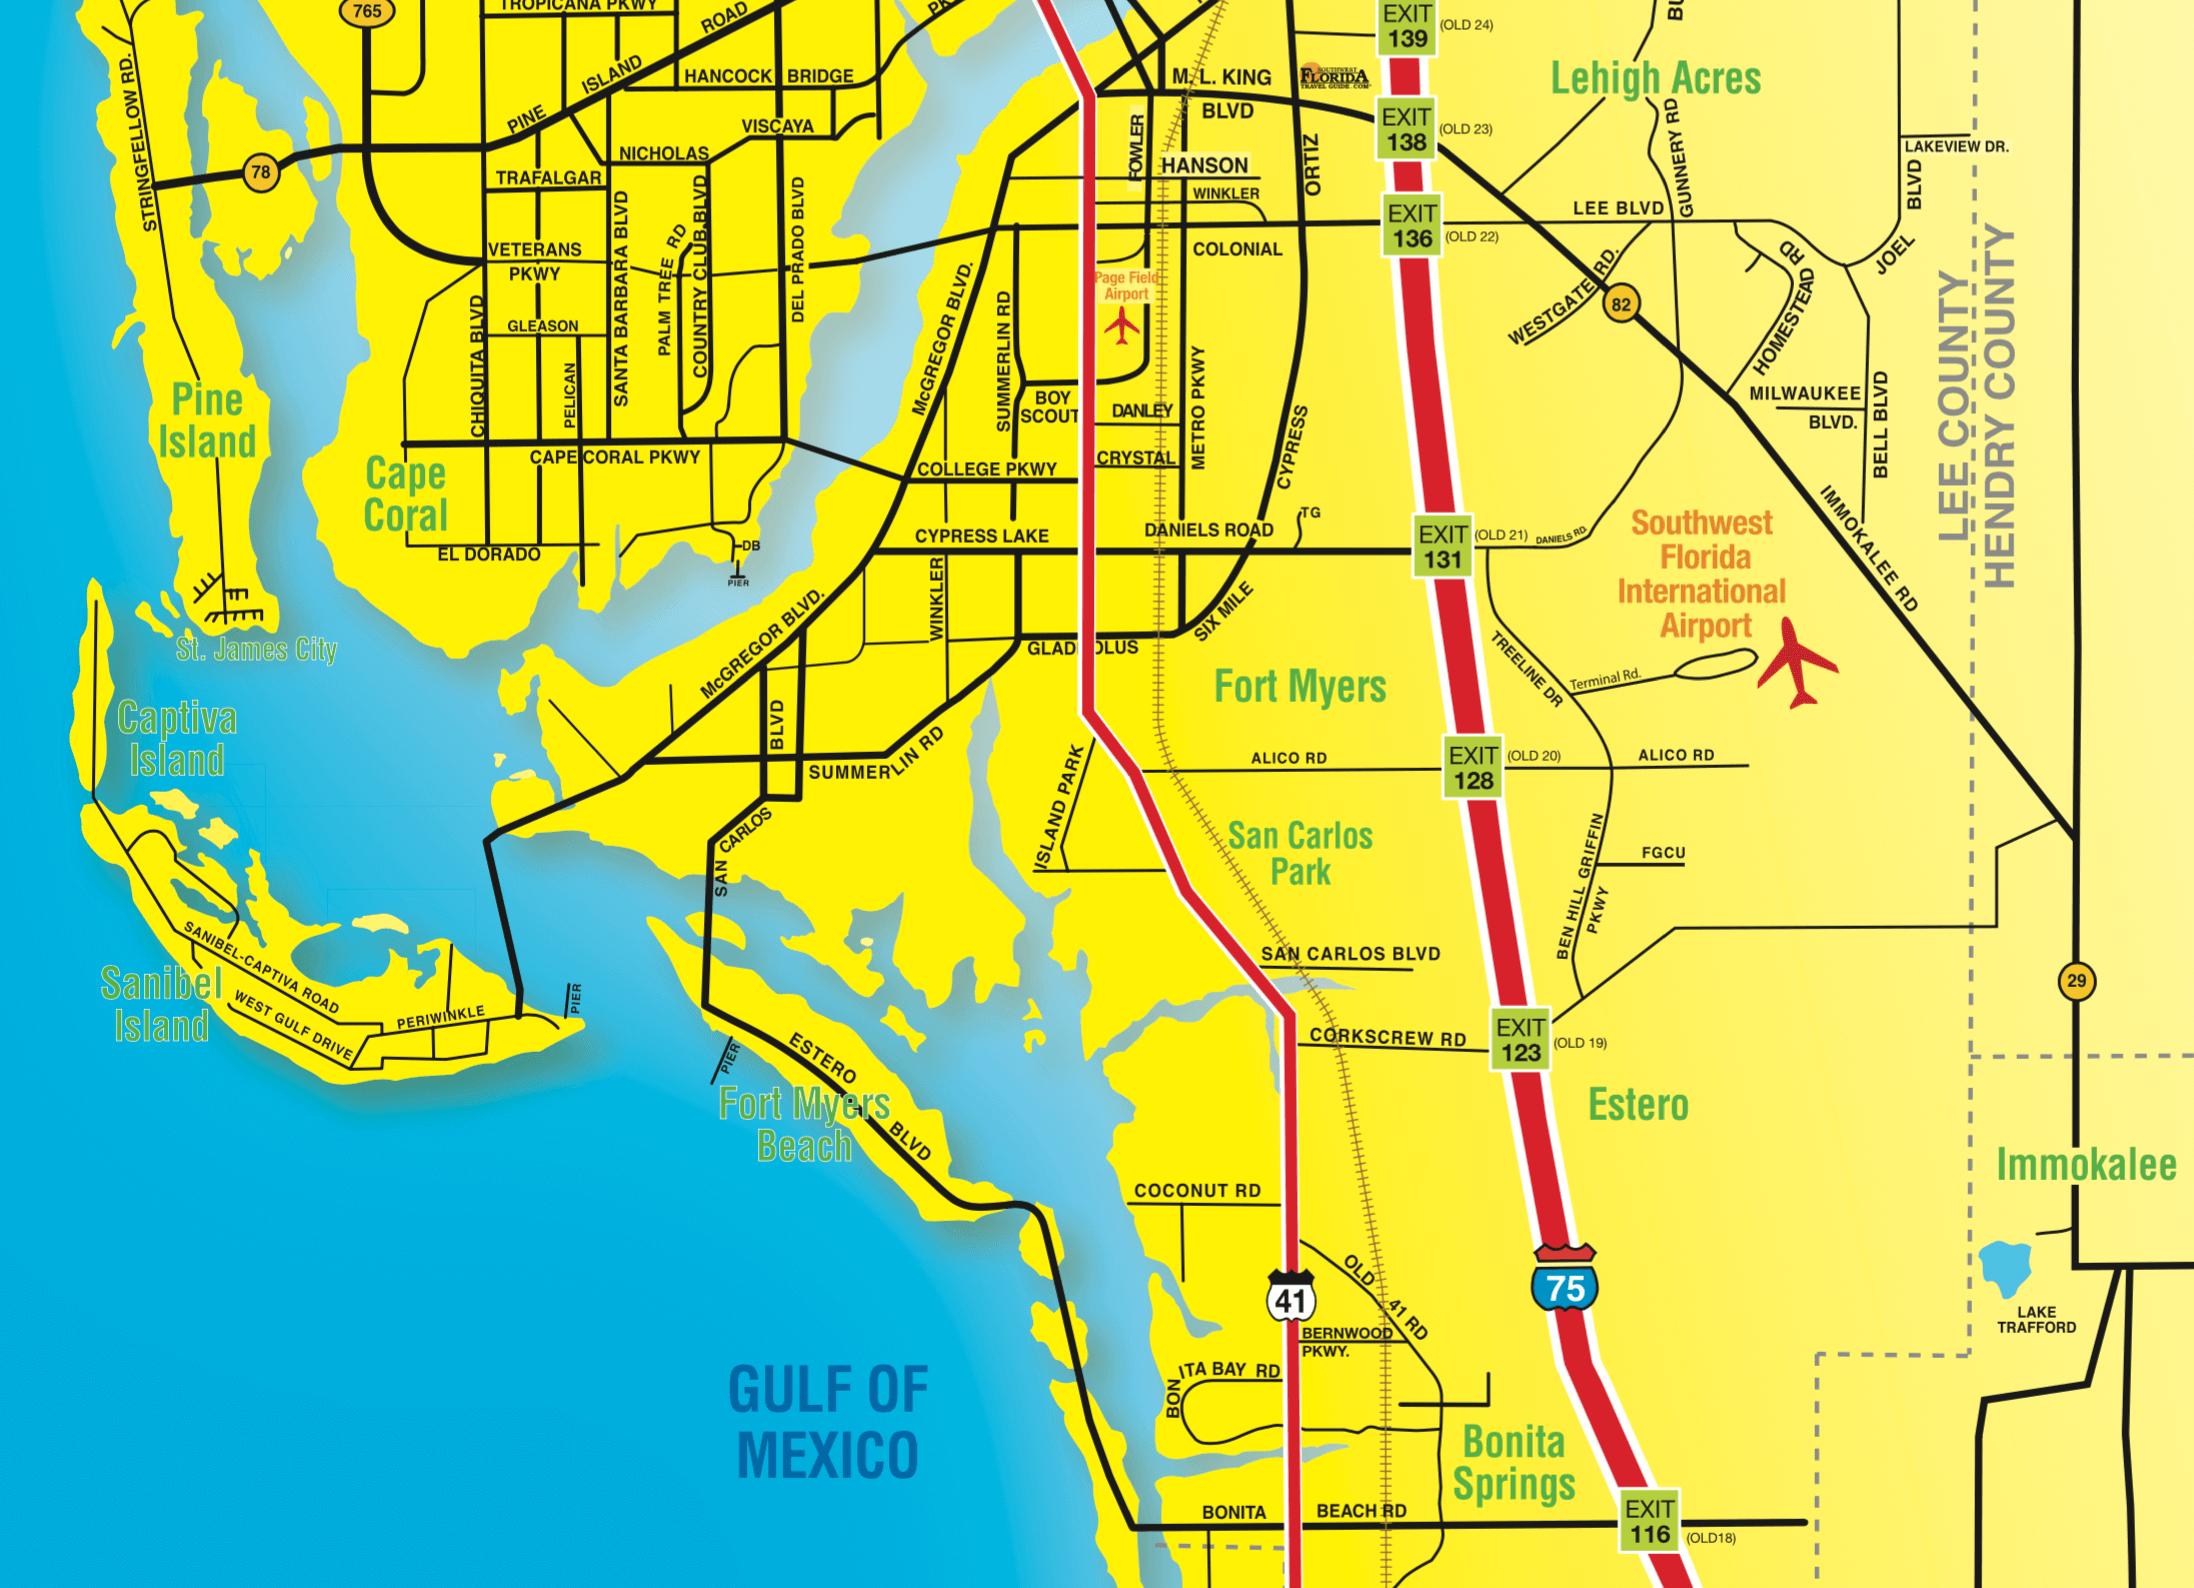 Florida Maps - Southwest Florida Travel - Map Of Sw Florida Beaches